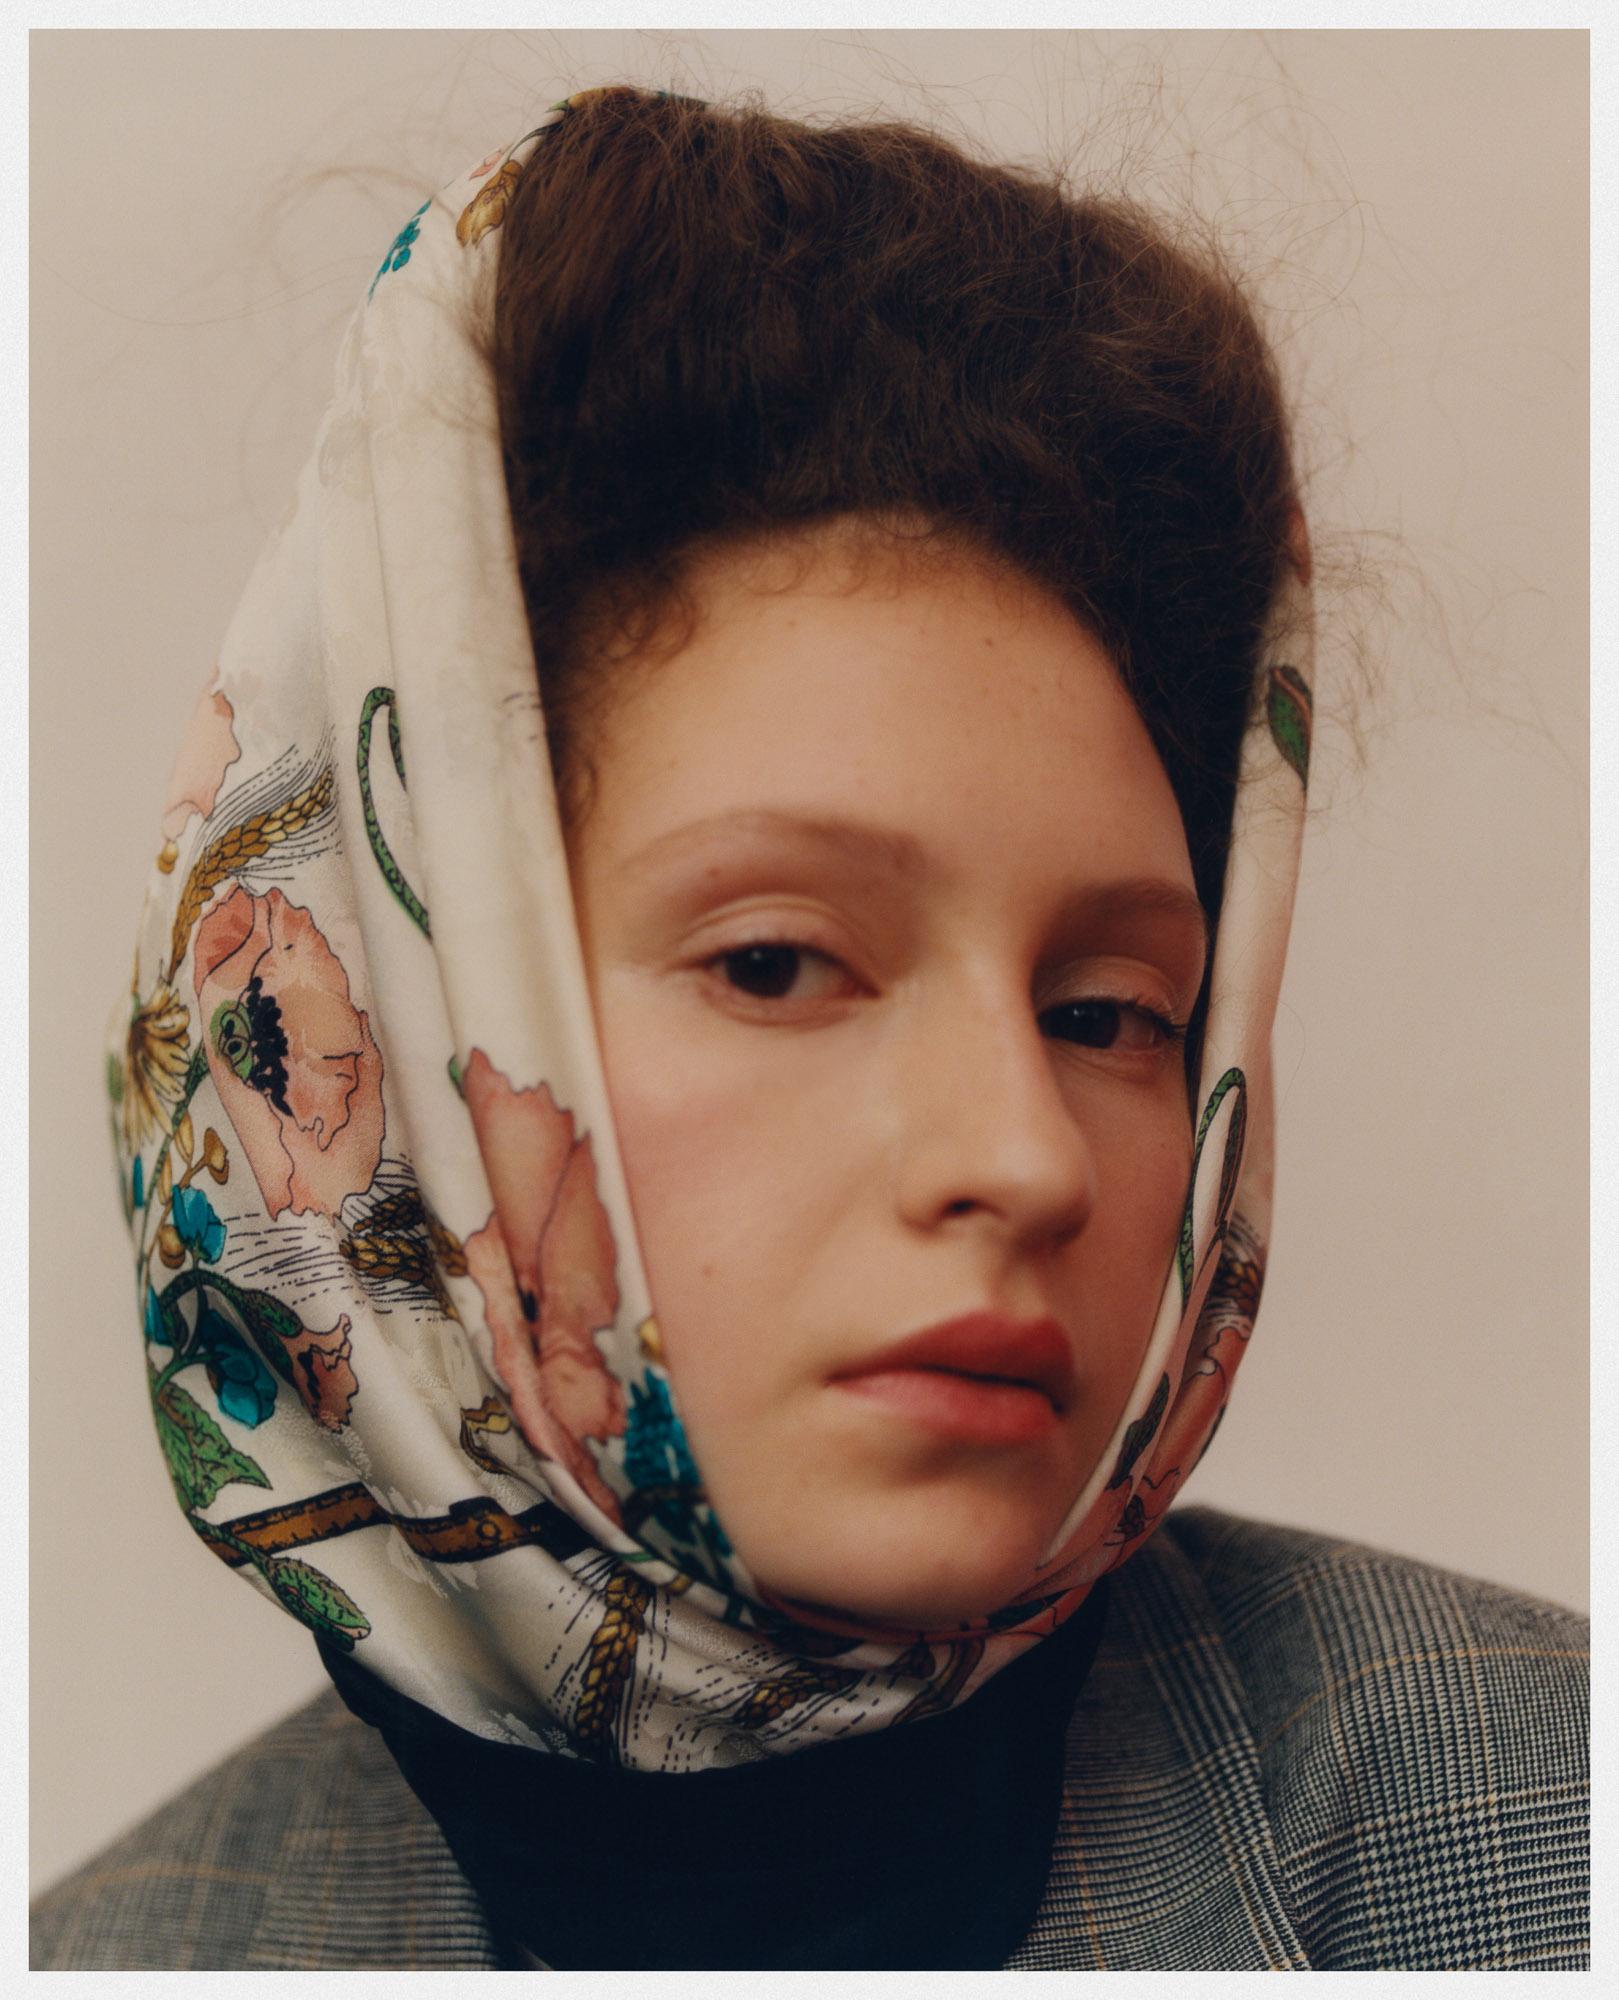 Claudia_De-Meis-89.jpg